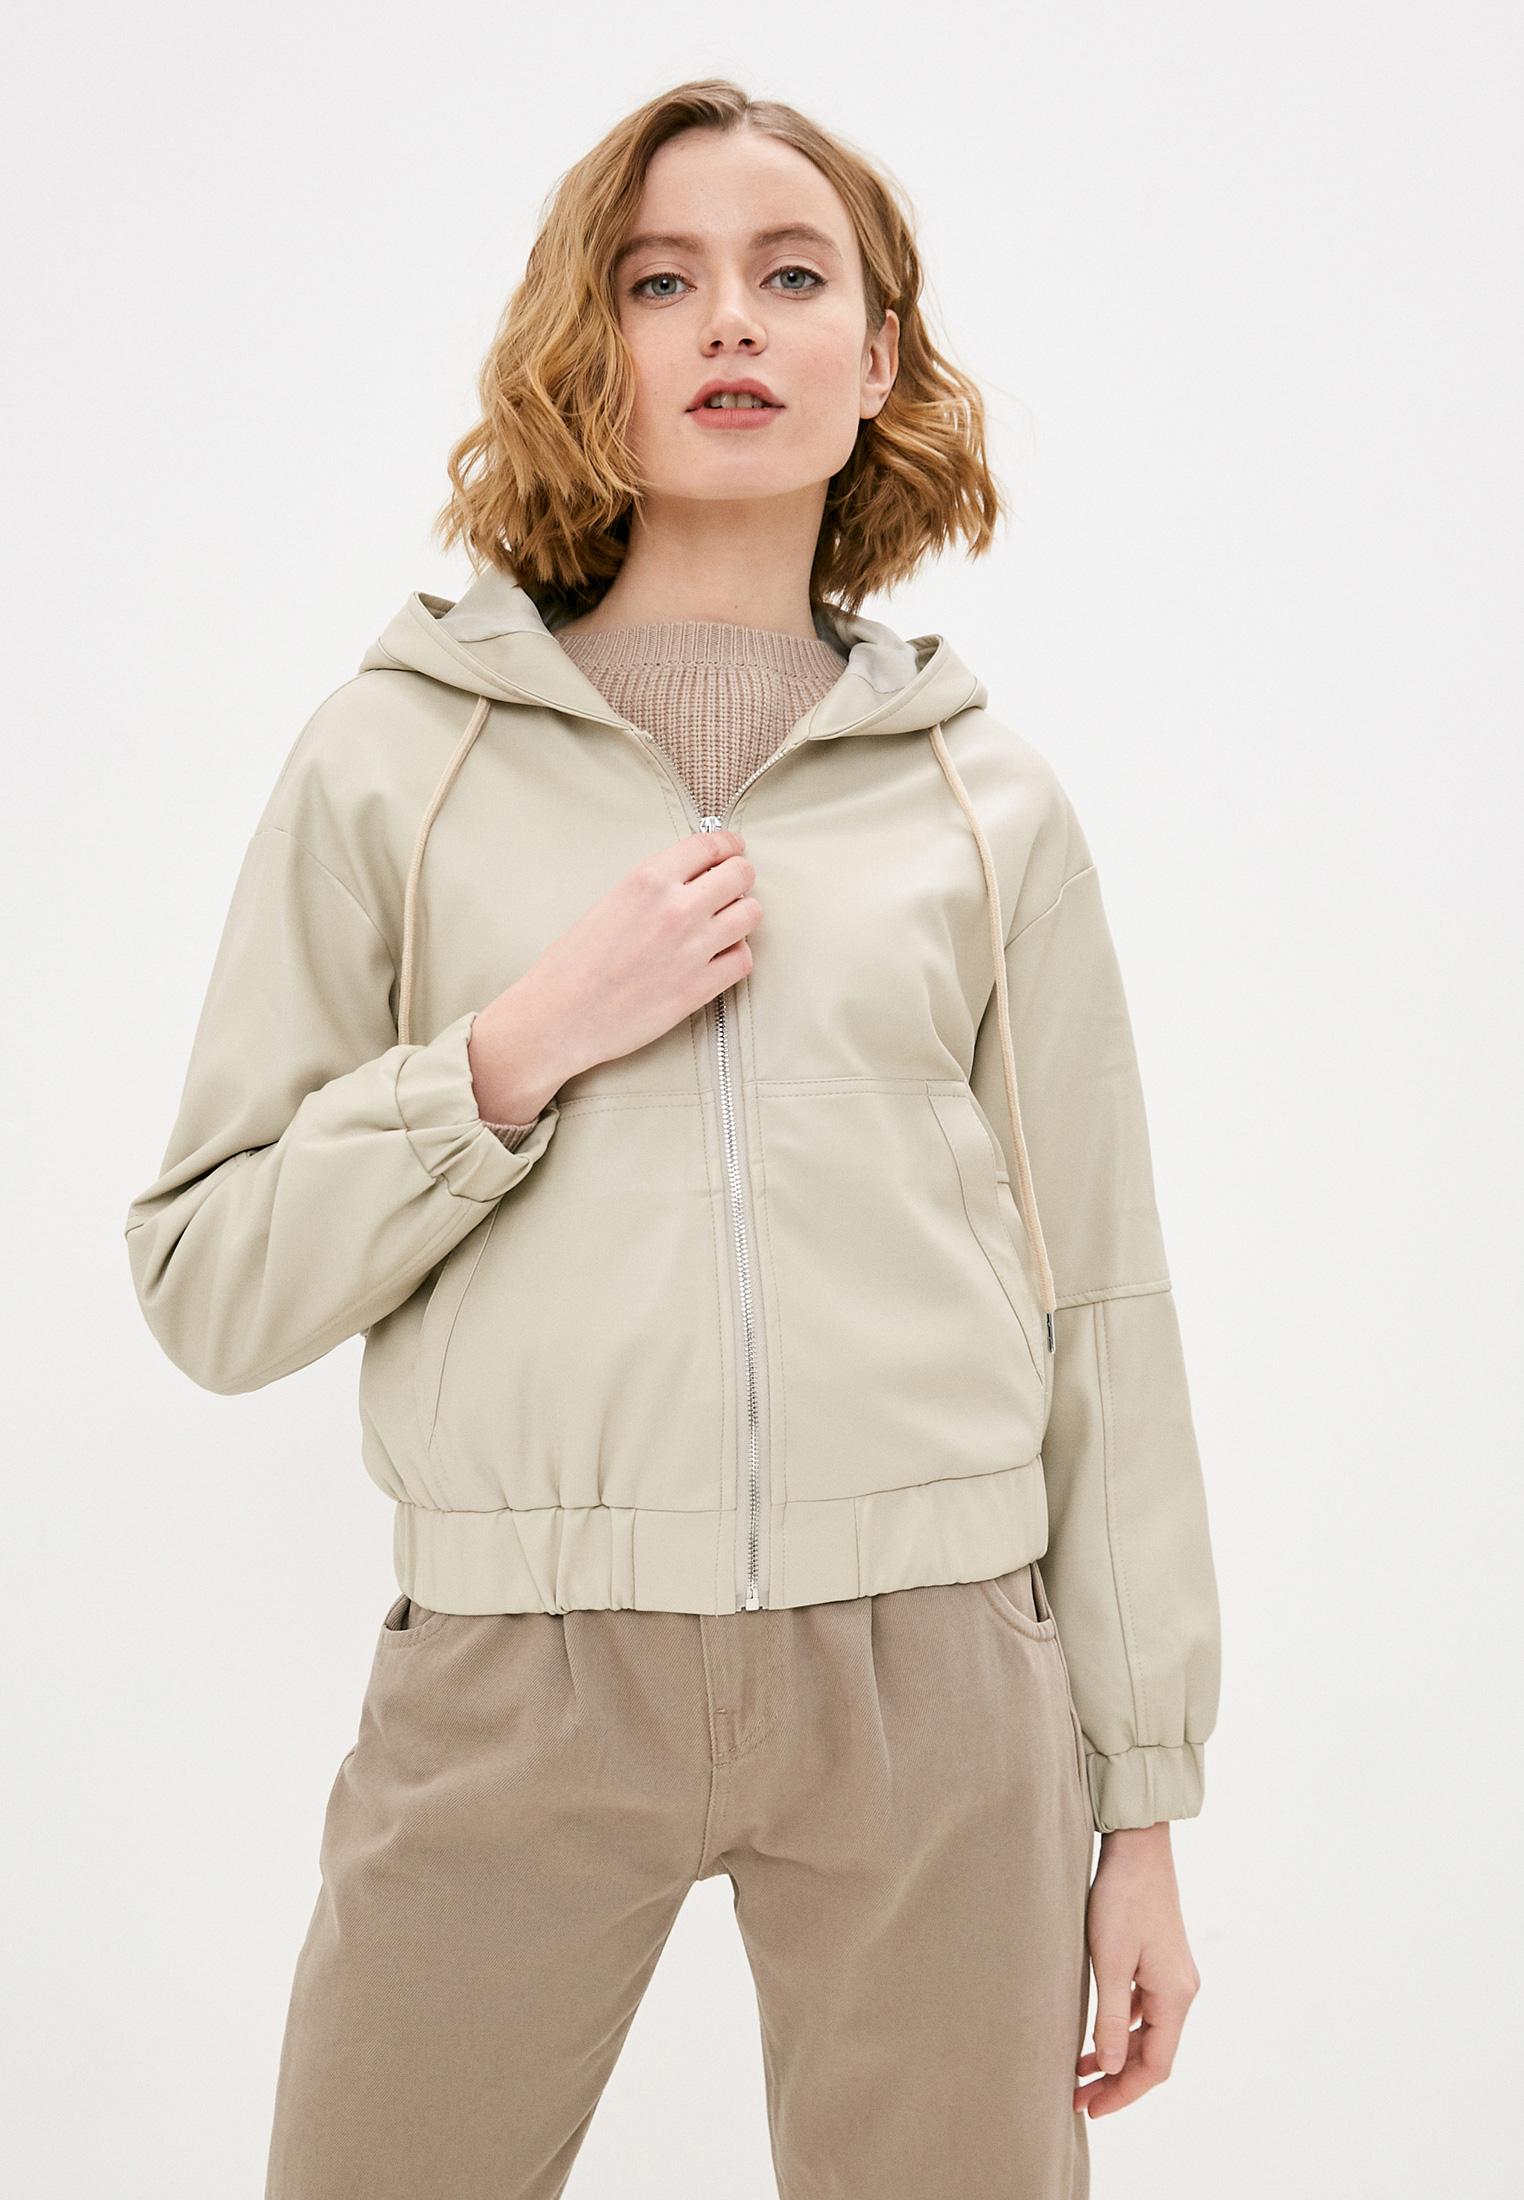 Кожаная куртка Diverius 9339